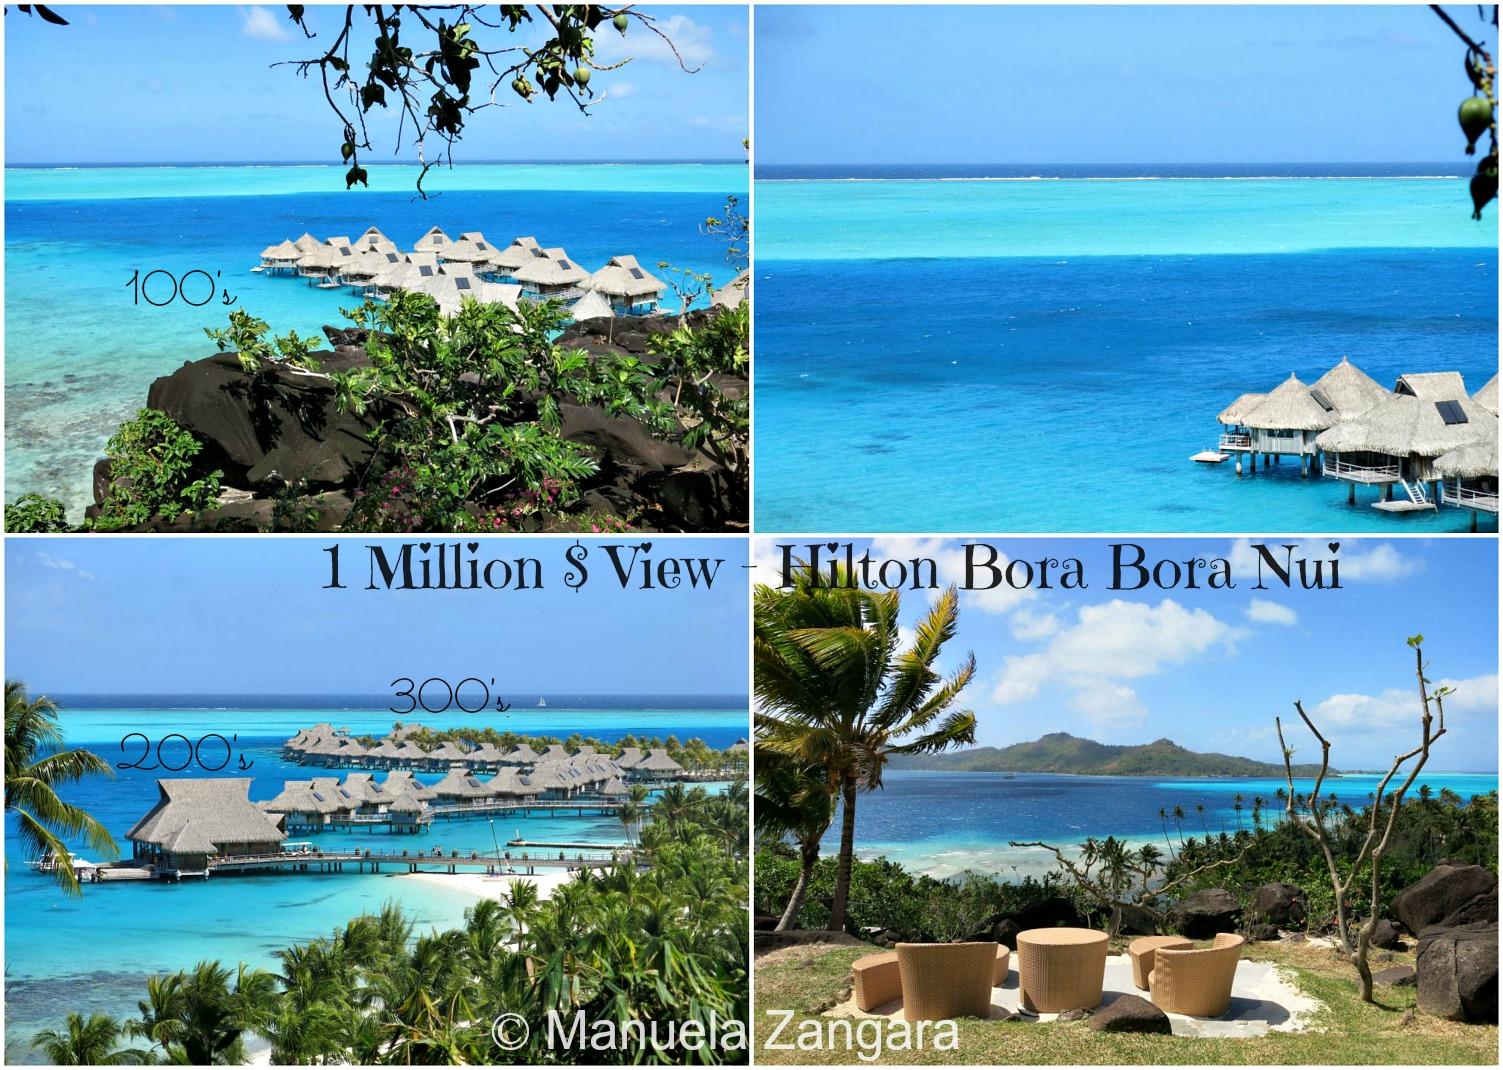 Million Dollar View HBB 4